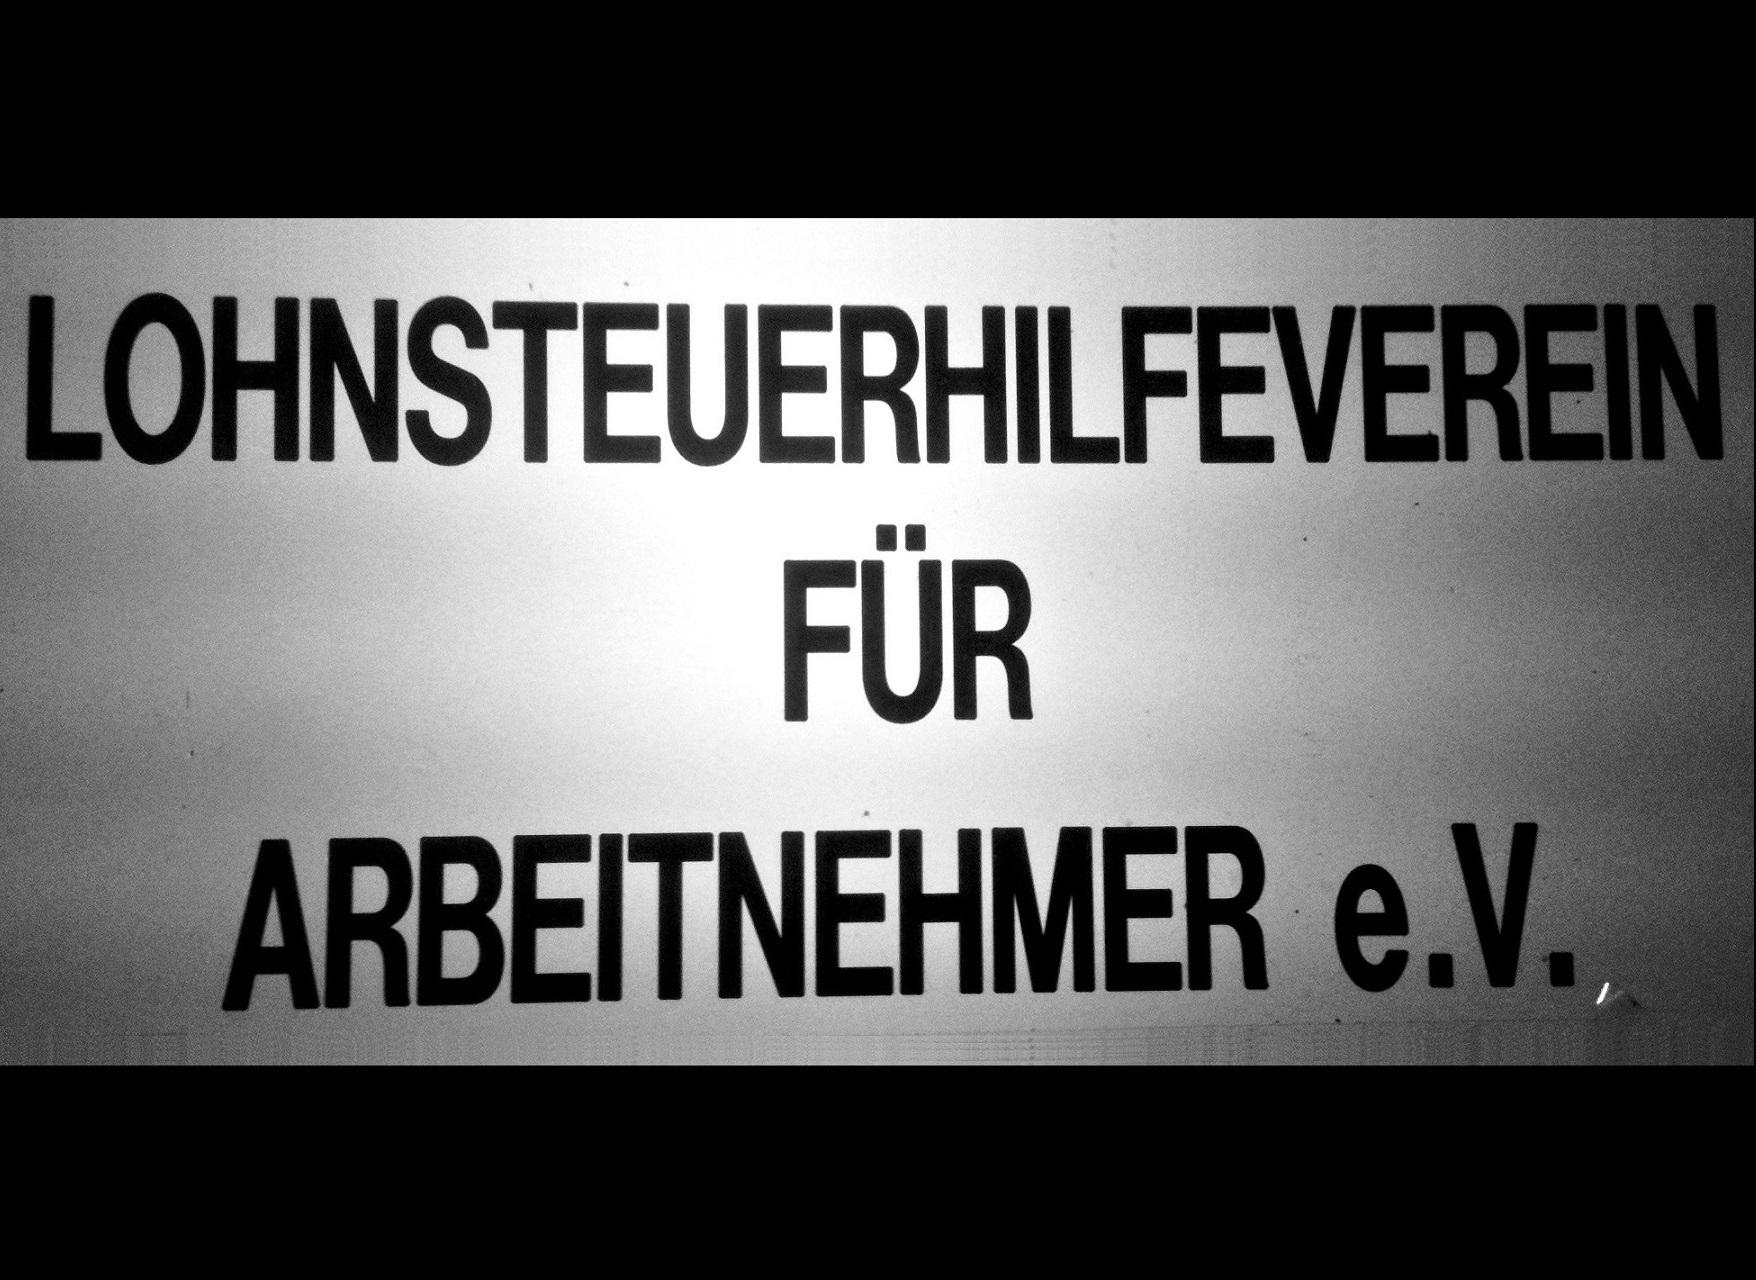 Lohnsteuerhilfeverein - Erfurt, Jena, Thüringen